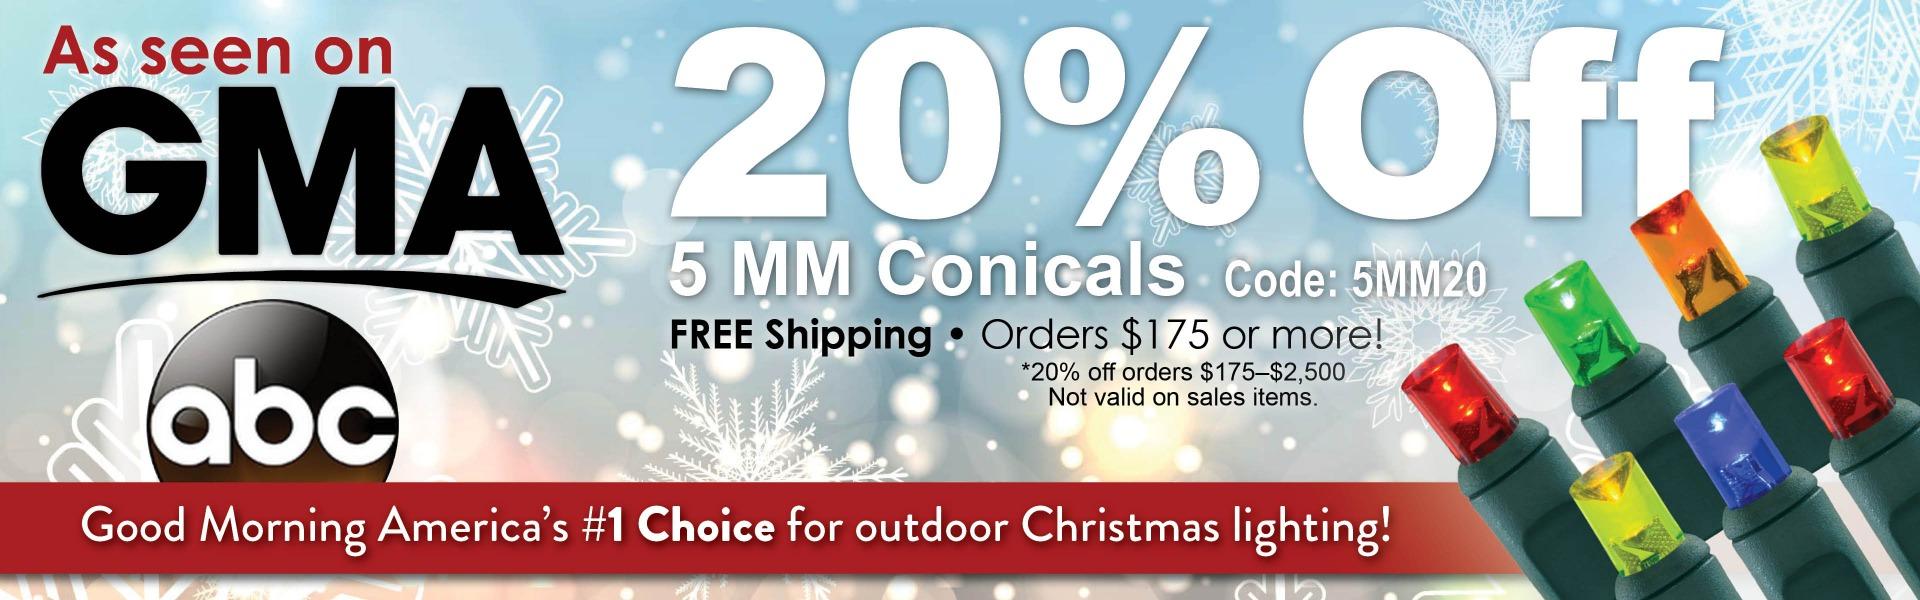 20% Off Conicals